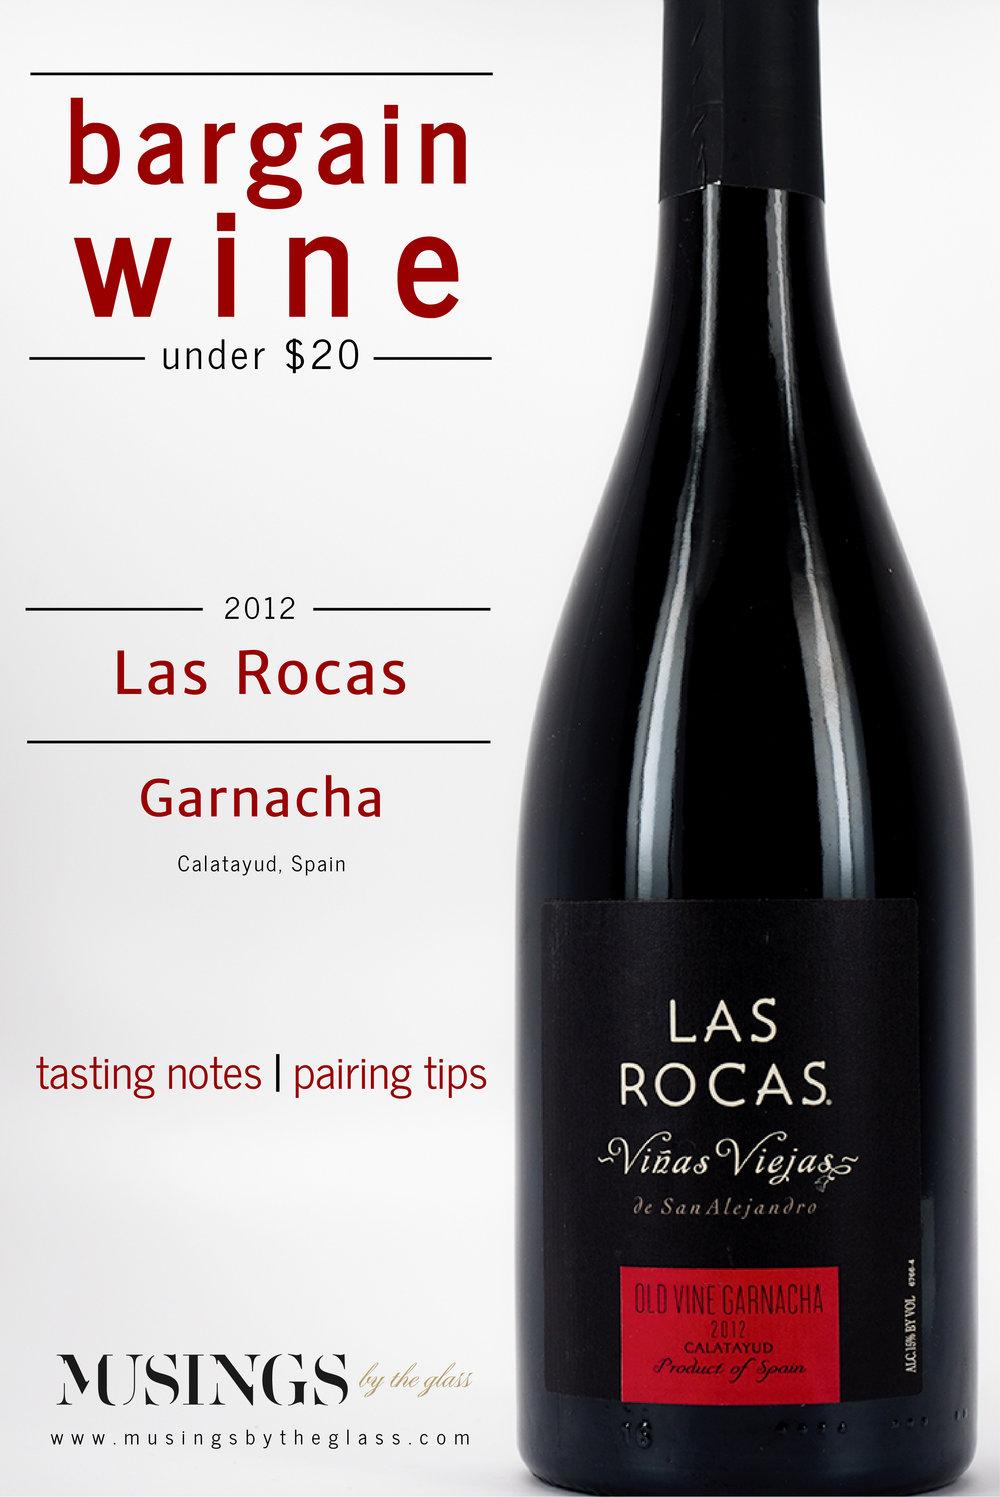 Musings by the Glass - Bargain Wines - 2012 Las Rocas Garnacha Calatayud Spain